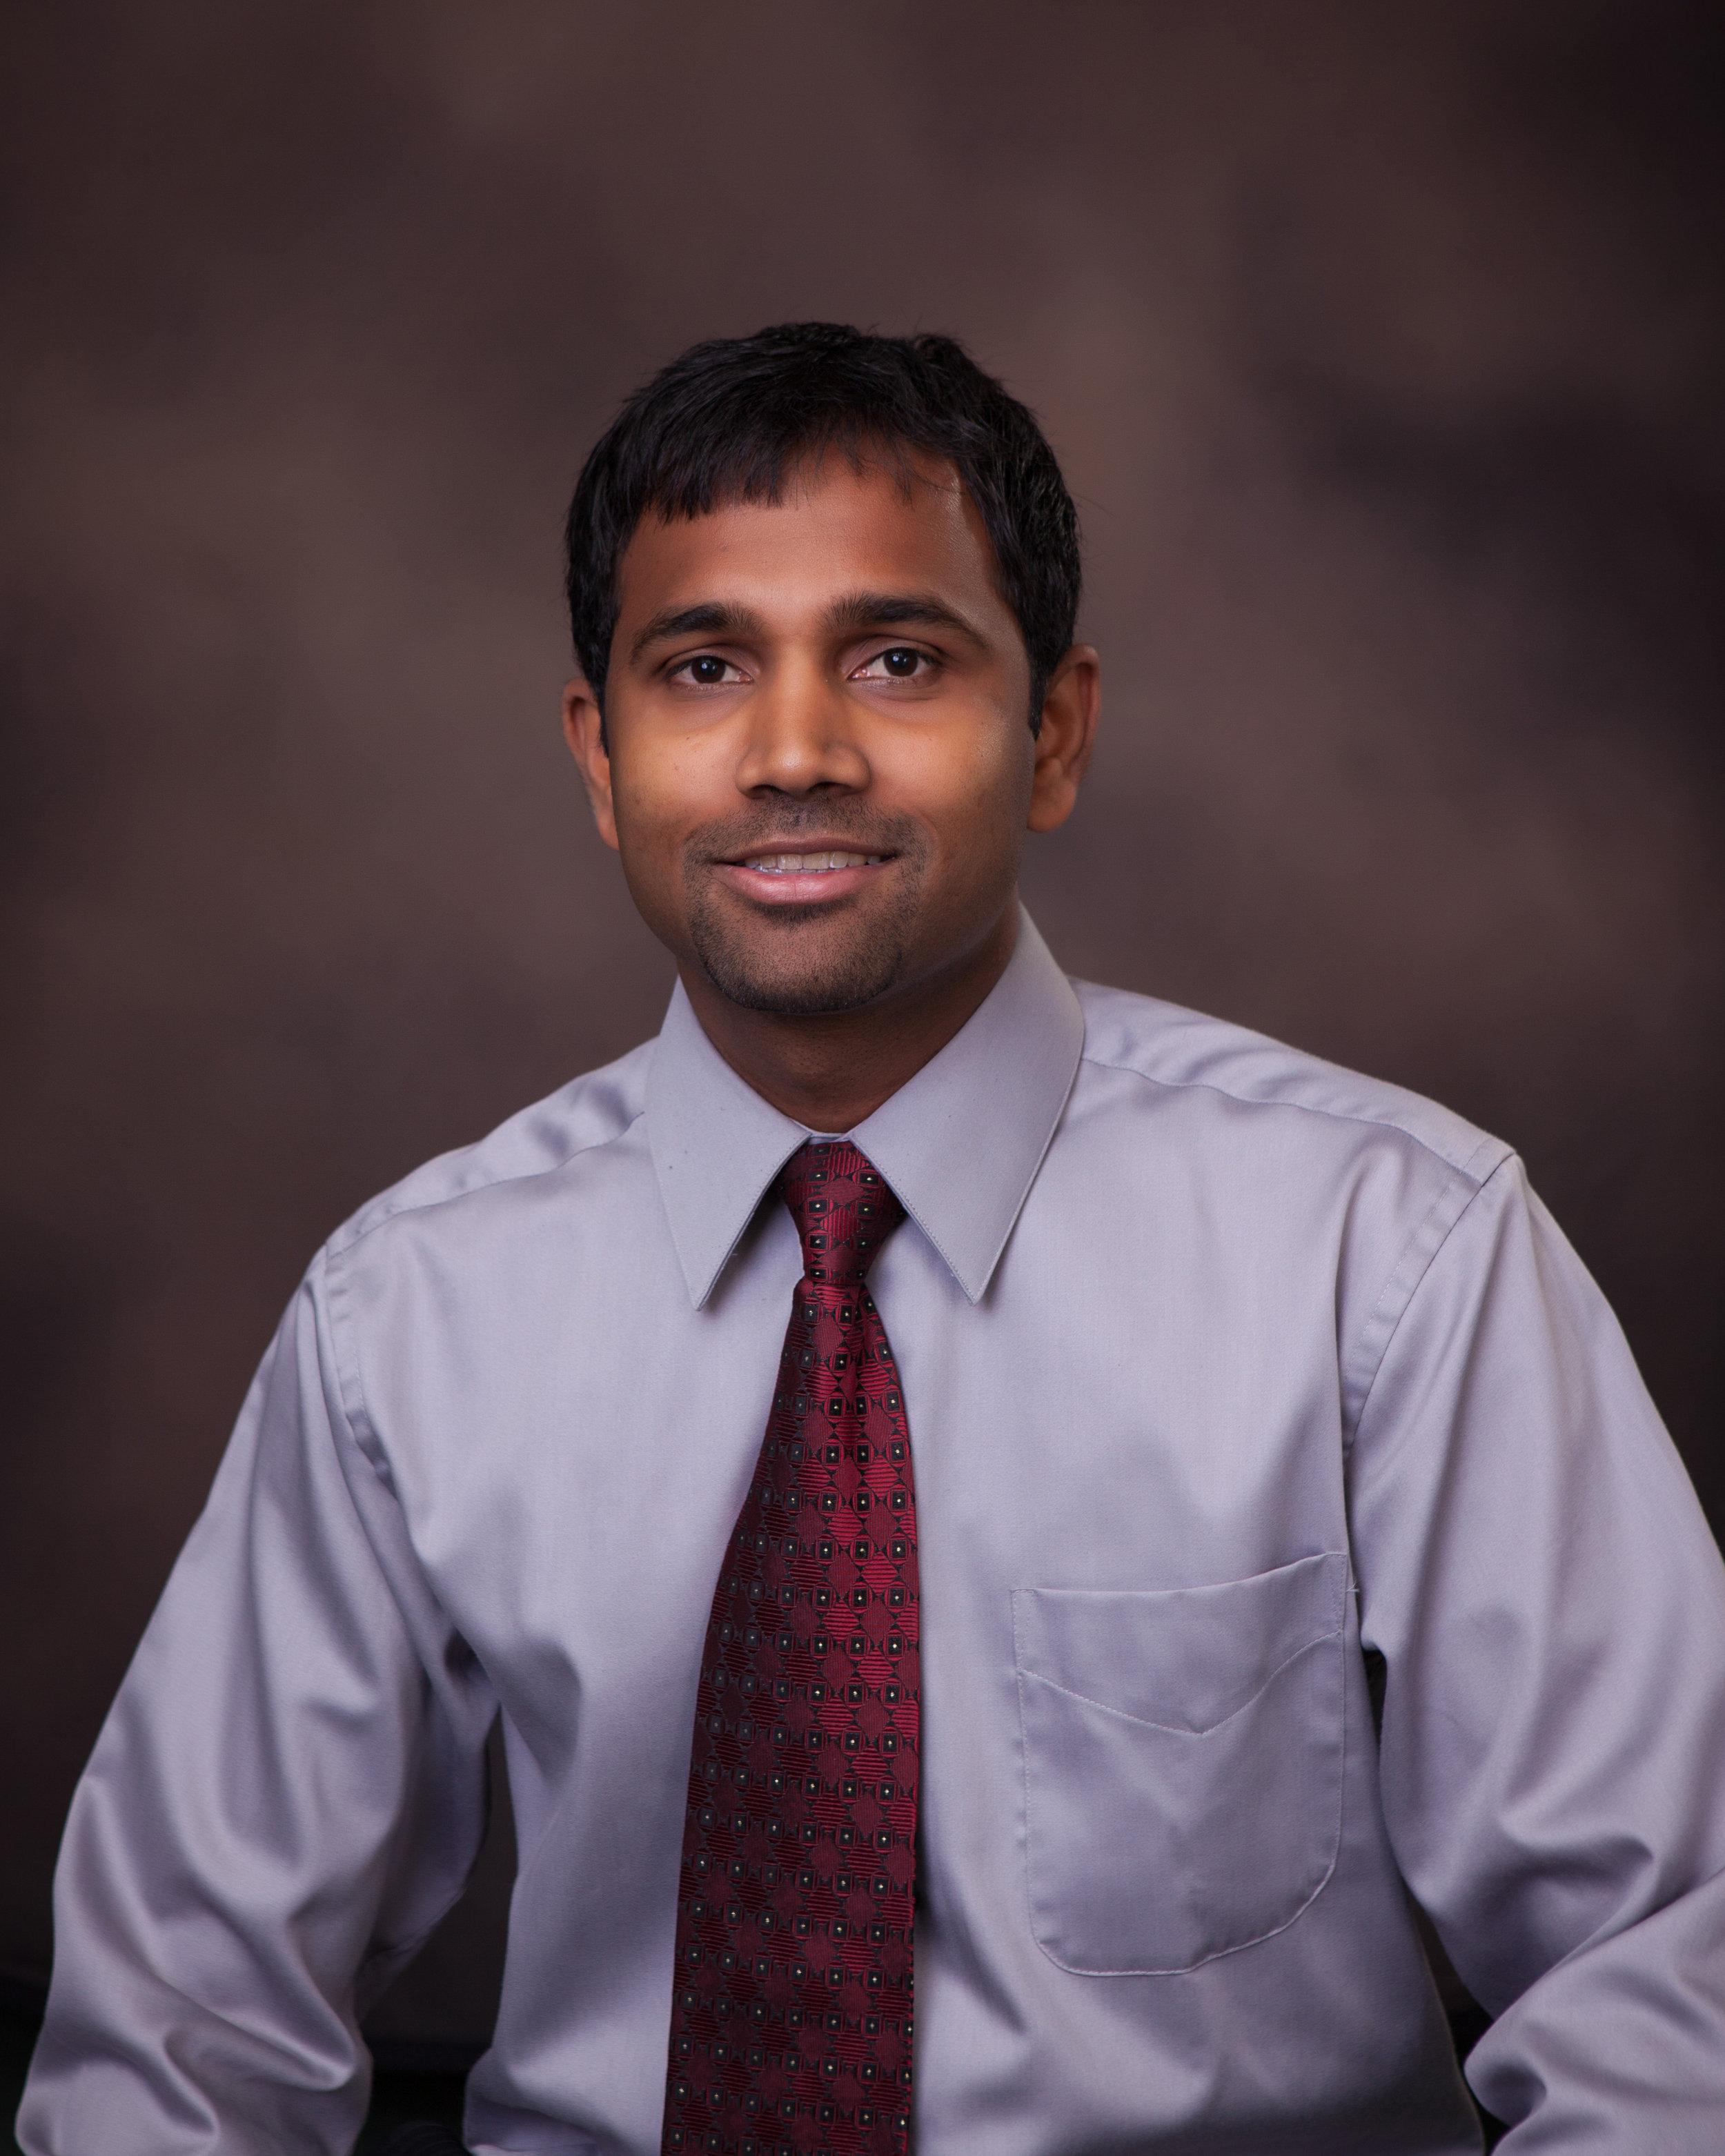 BHARATH KARNATI, M.D.  Hospitalist / Medical Director  BHARATH.KARNATI@nlgh.org  (484)223-6902